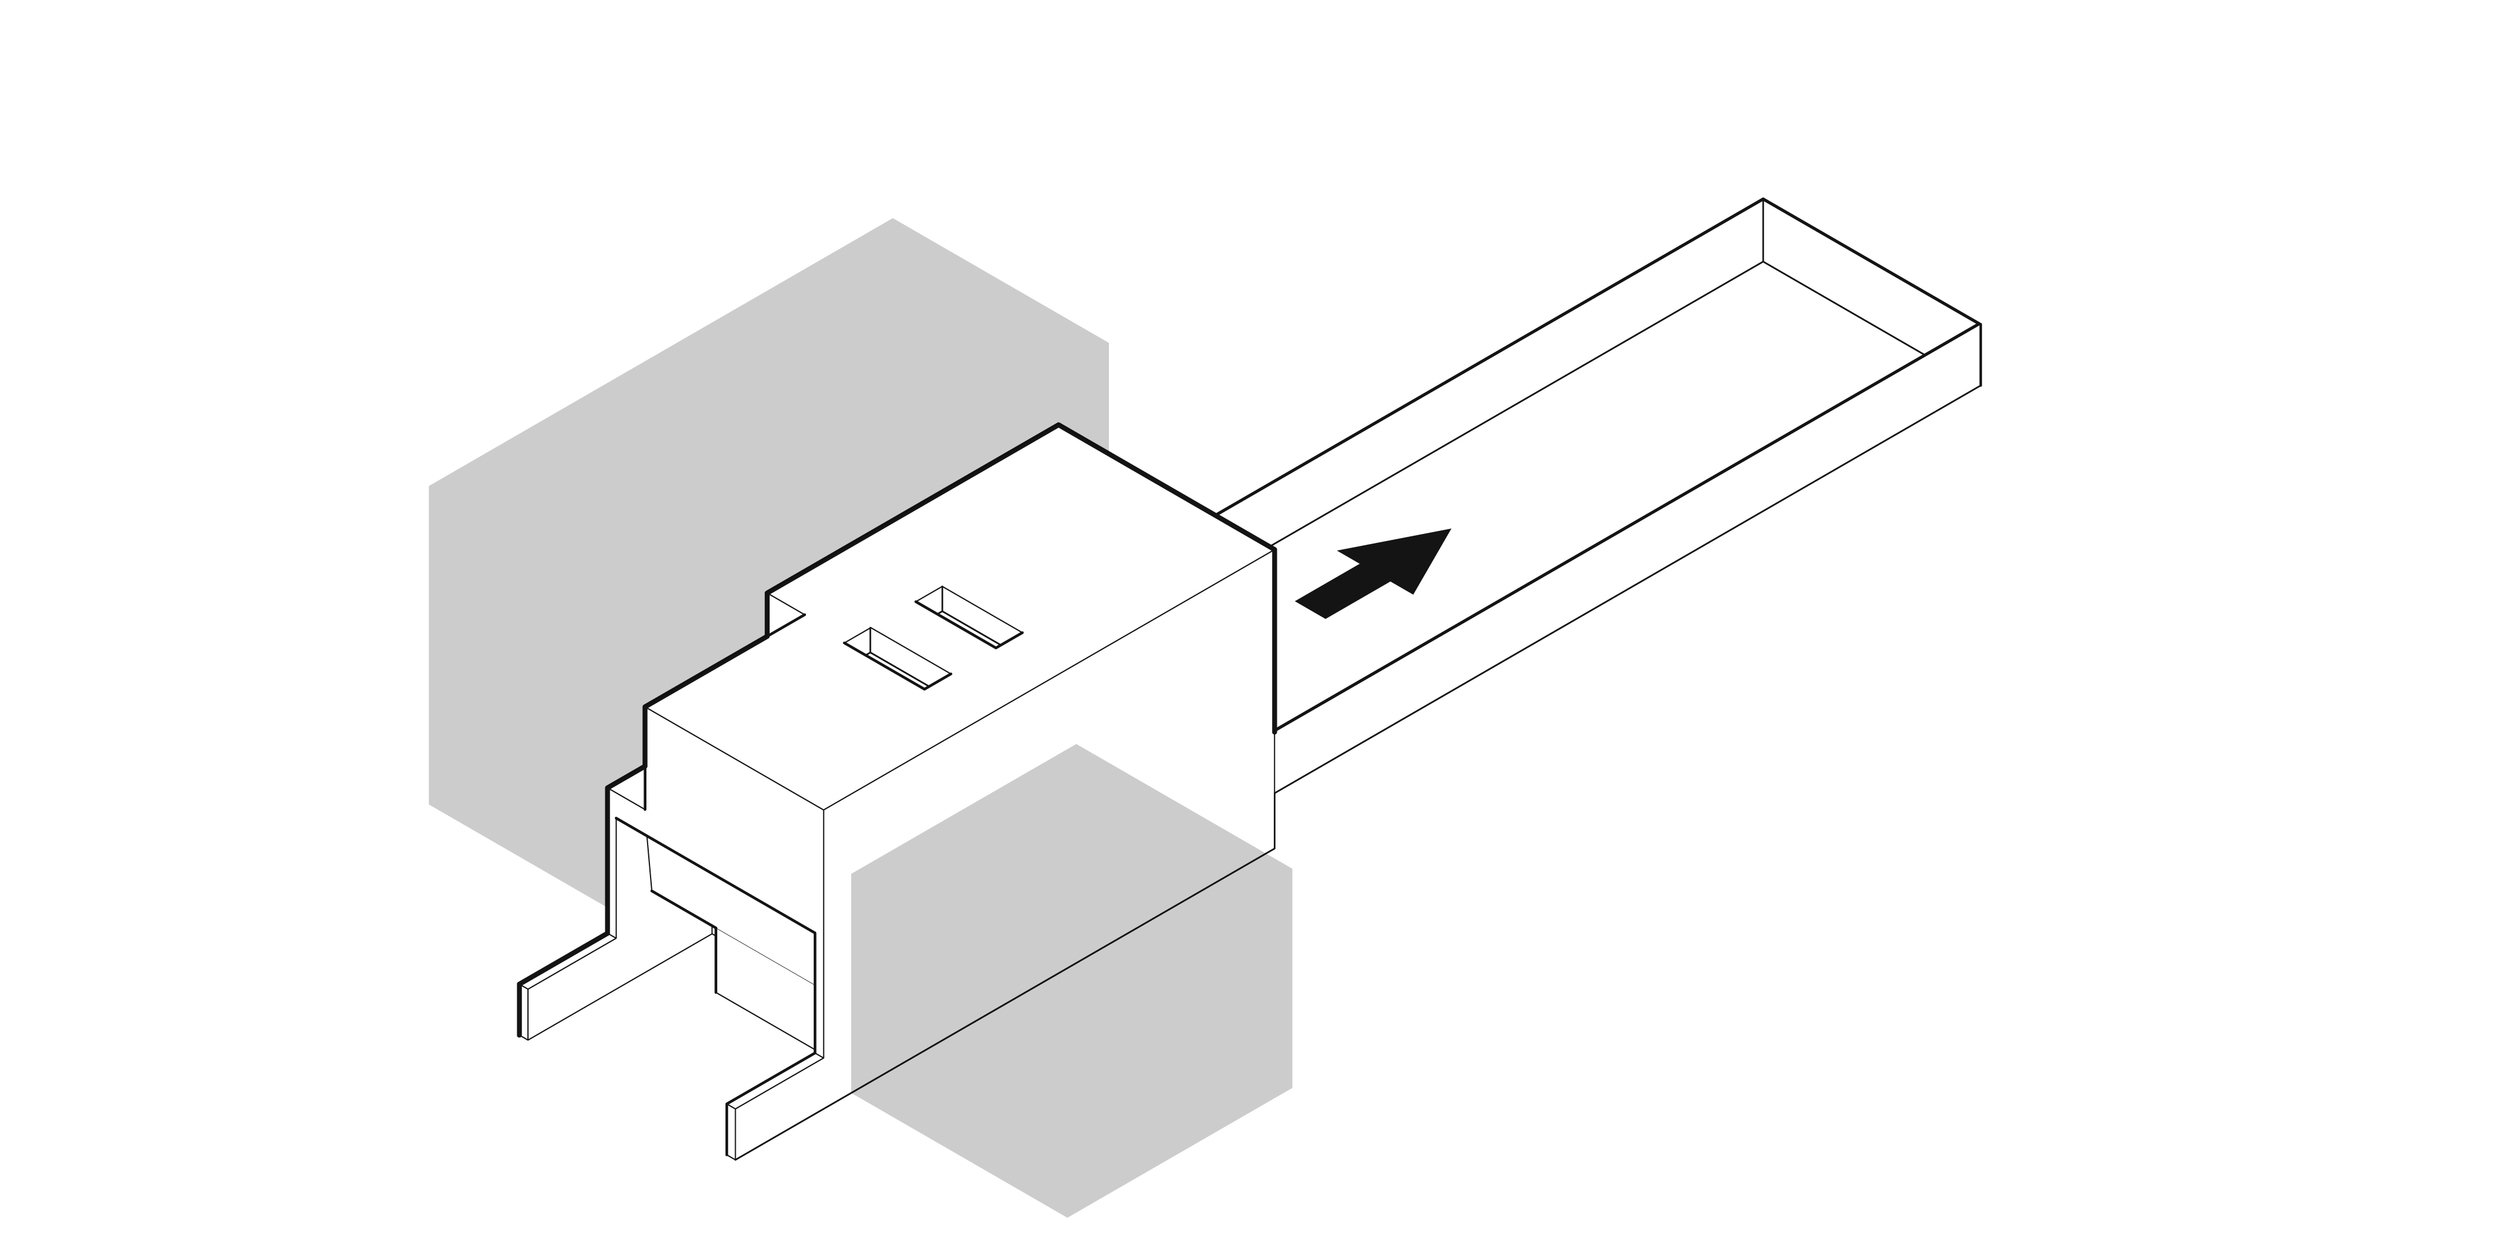 57_Highland-160413-Diagram-09-01.jpg